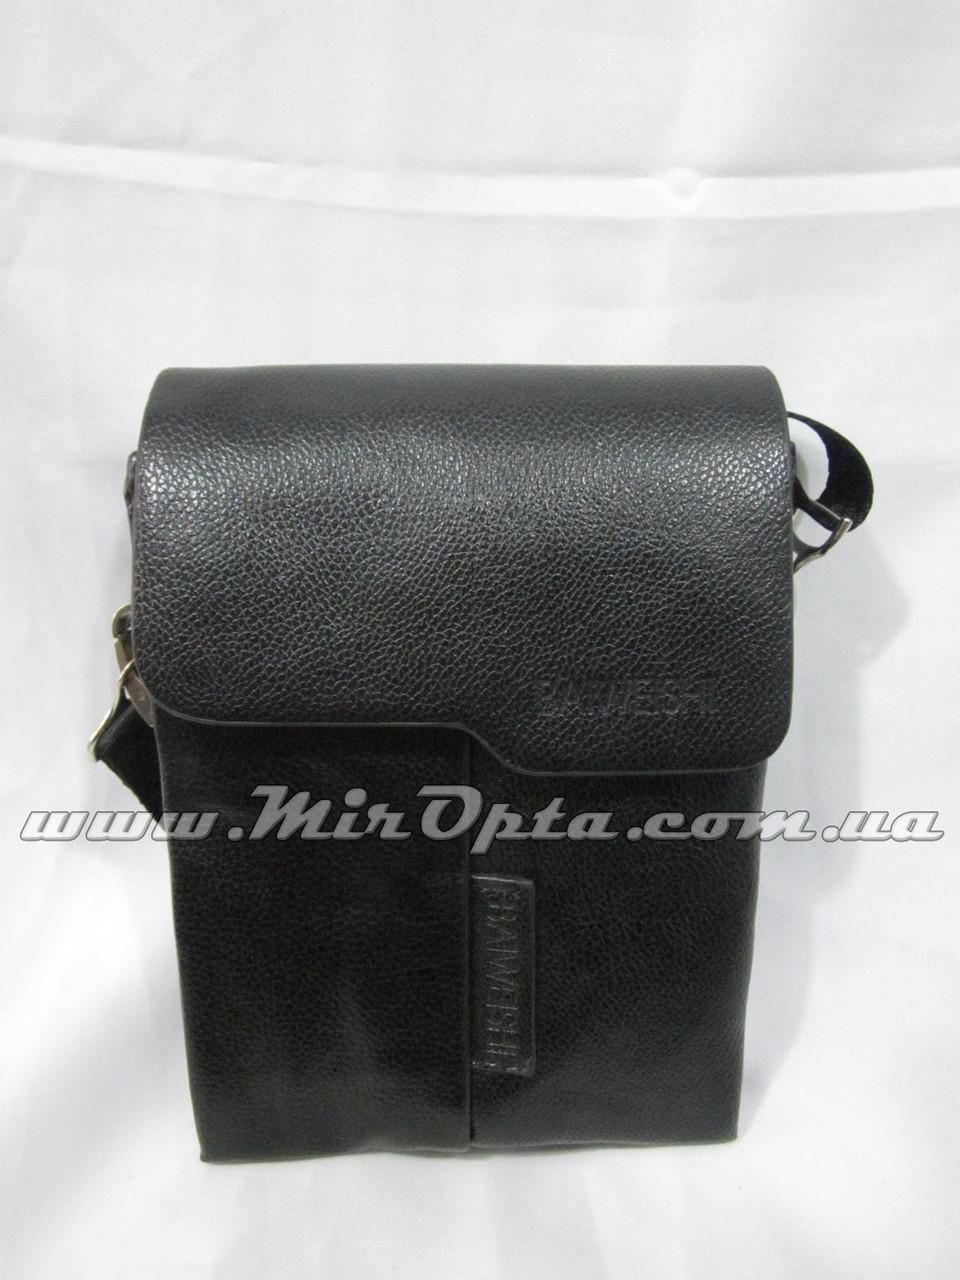 39a73f4d8ddb Мужская сумка 20165-1 (15 х 20 см.) купить оптом от производителя ...